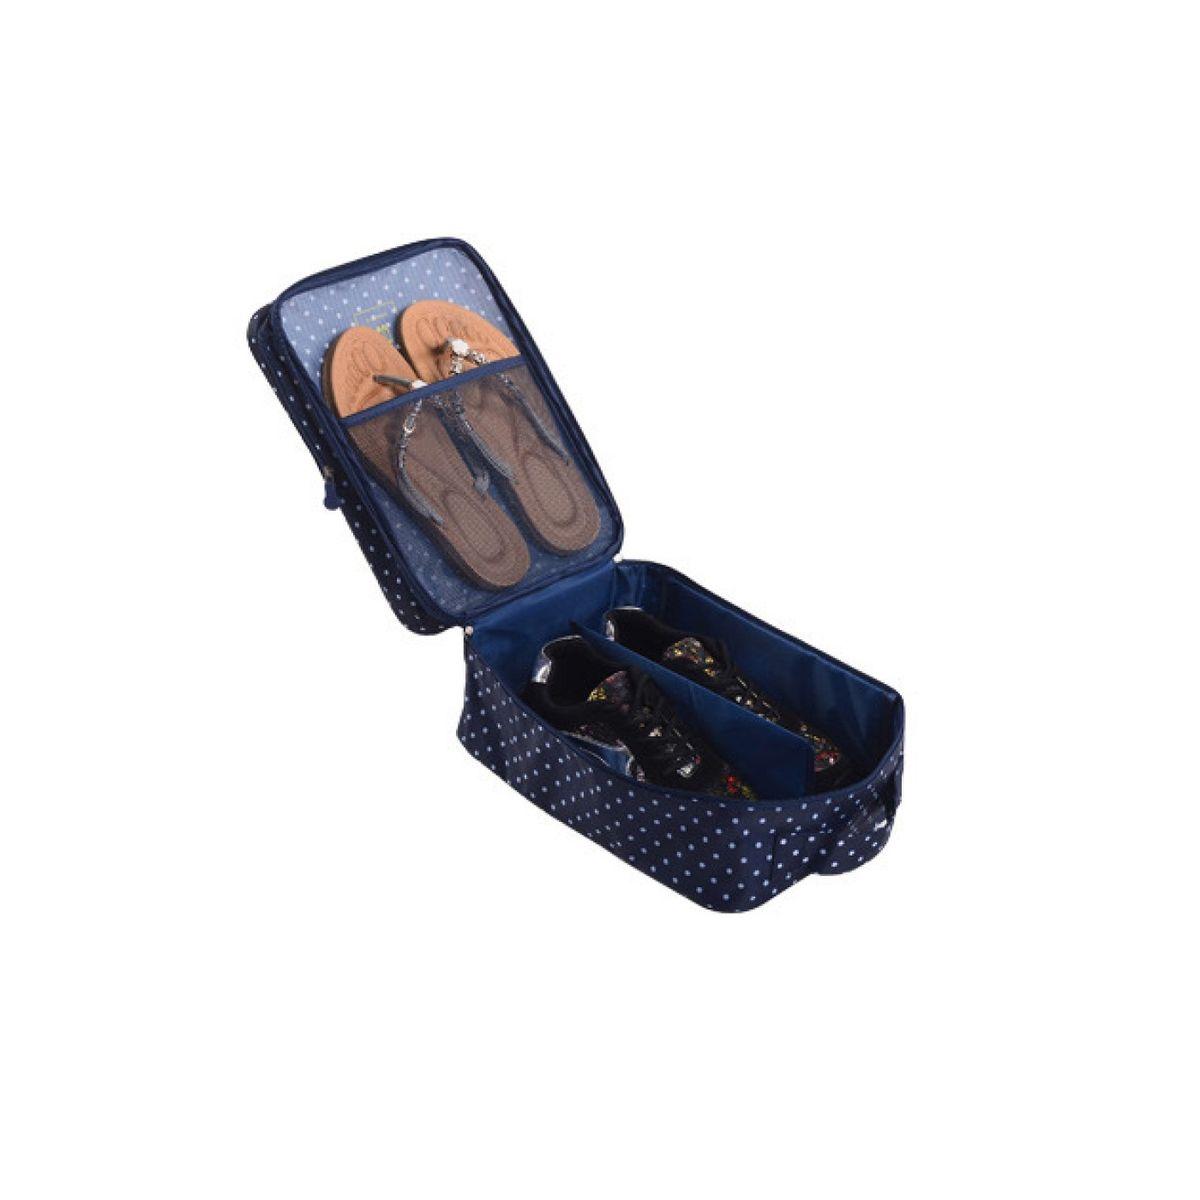 Органайзер для обуви Homsu, 32 x 20 x 13 см органайзер для хранения обуви homsu bora bora 52 х 26 х 12 см